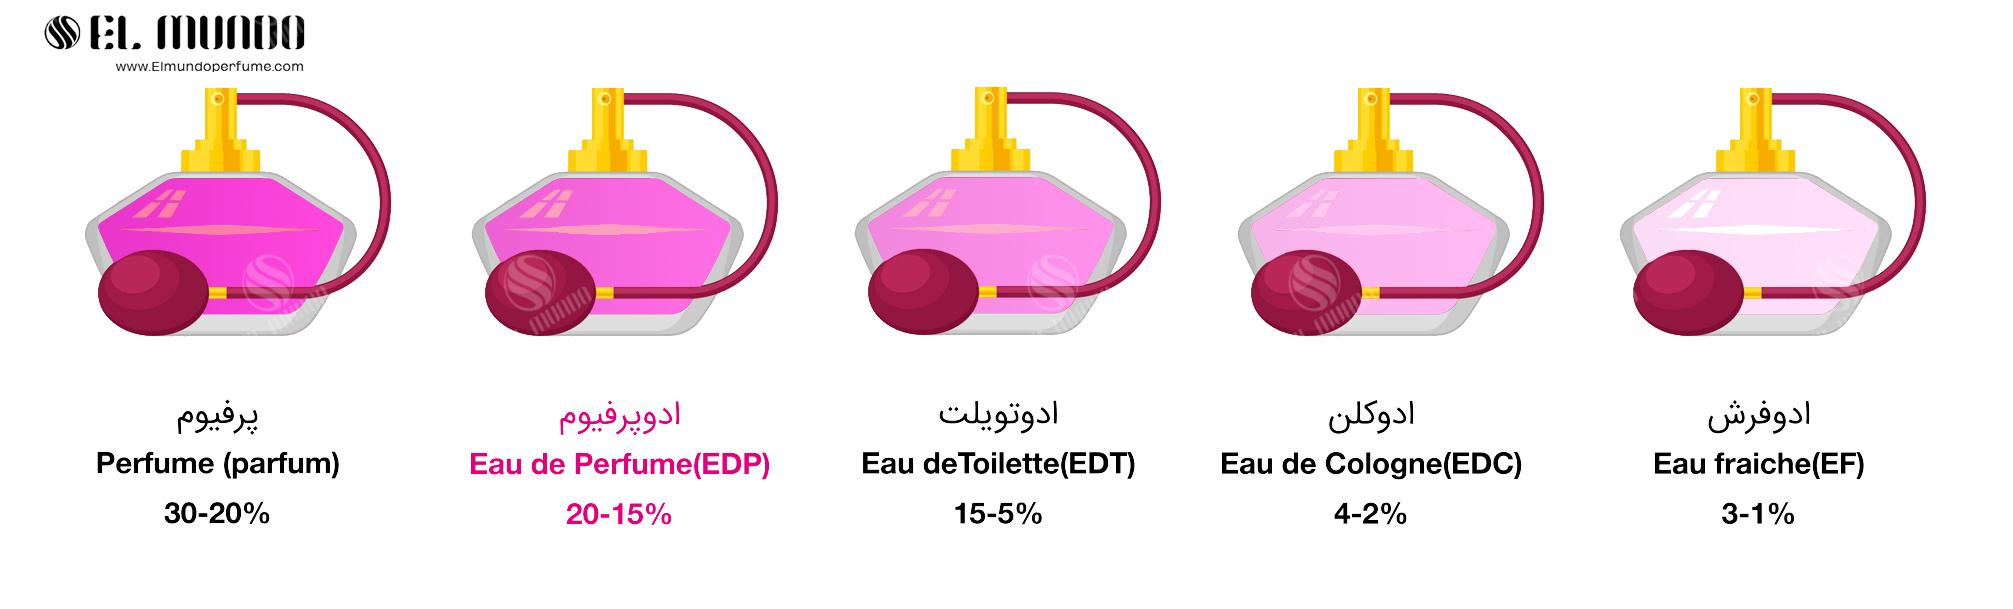 2 Eau de perfume - عطر ادکلن زنانه جنیفر لوپز استیل ادو پرفیوم ۱۰۰ میل Jennifer Lopez Still